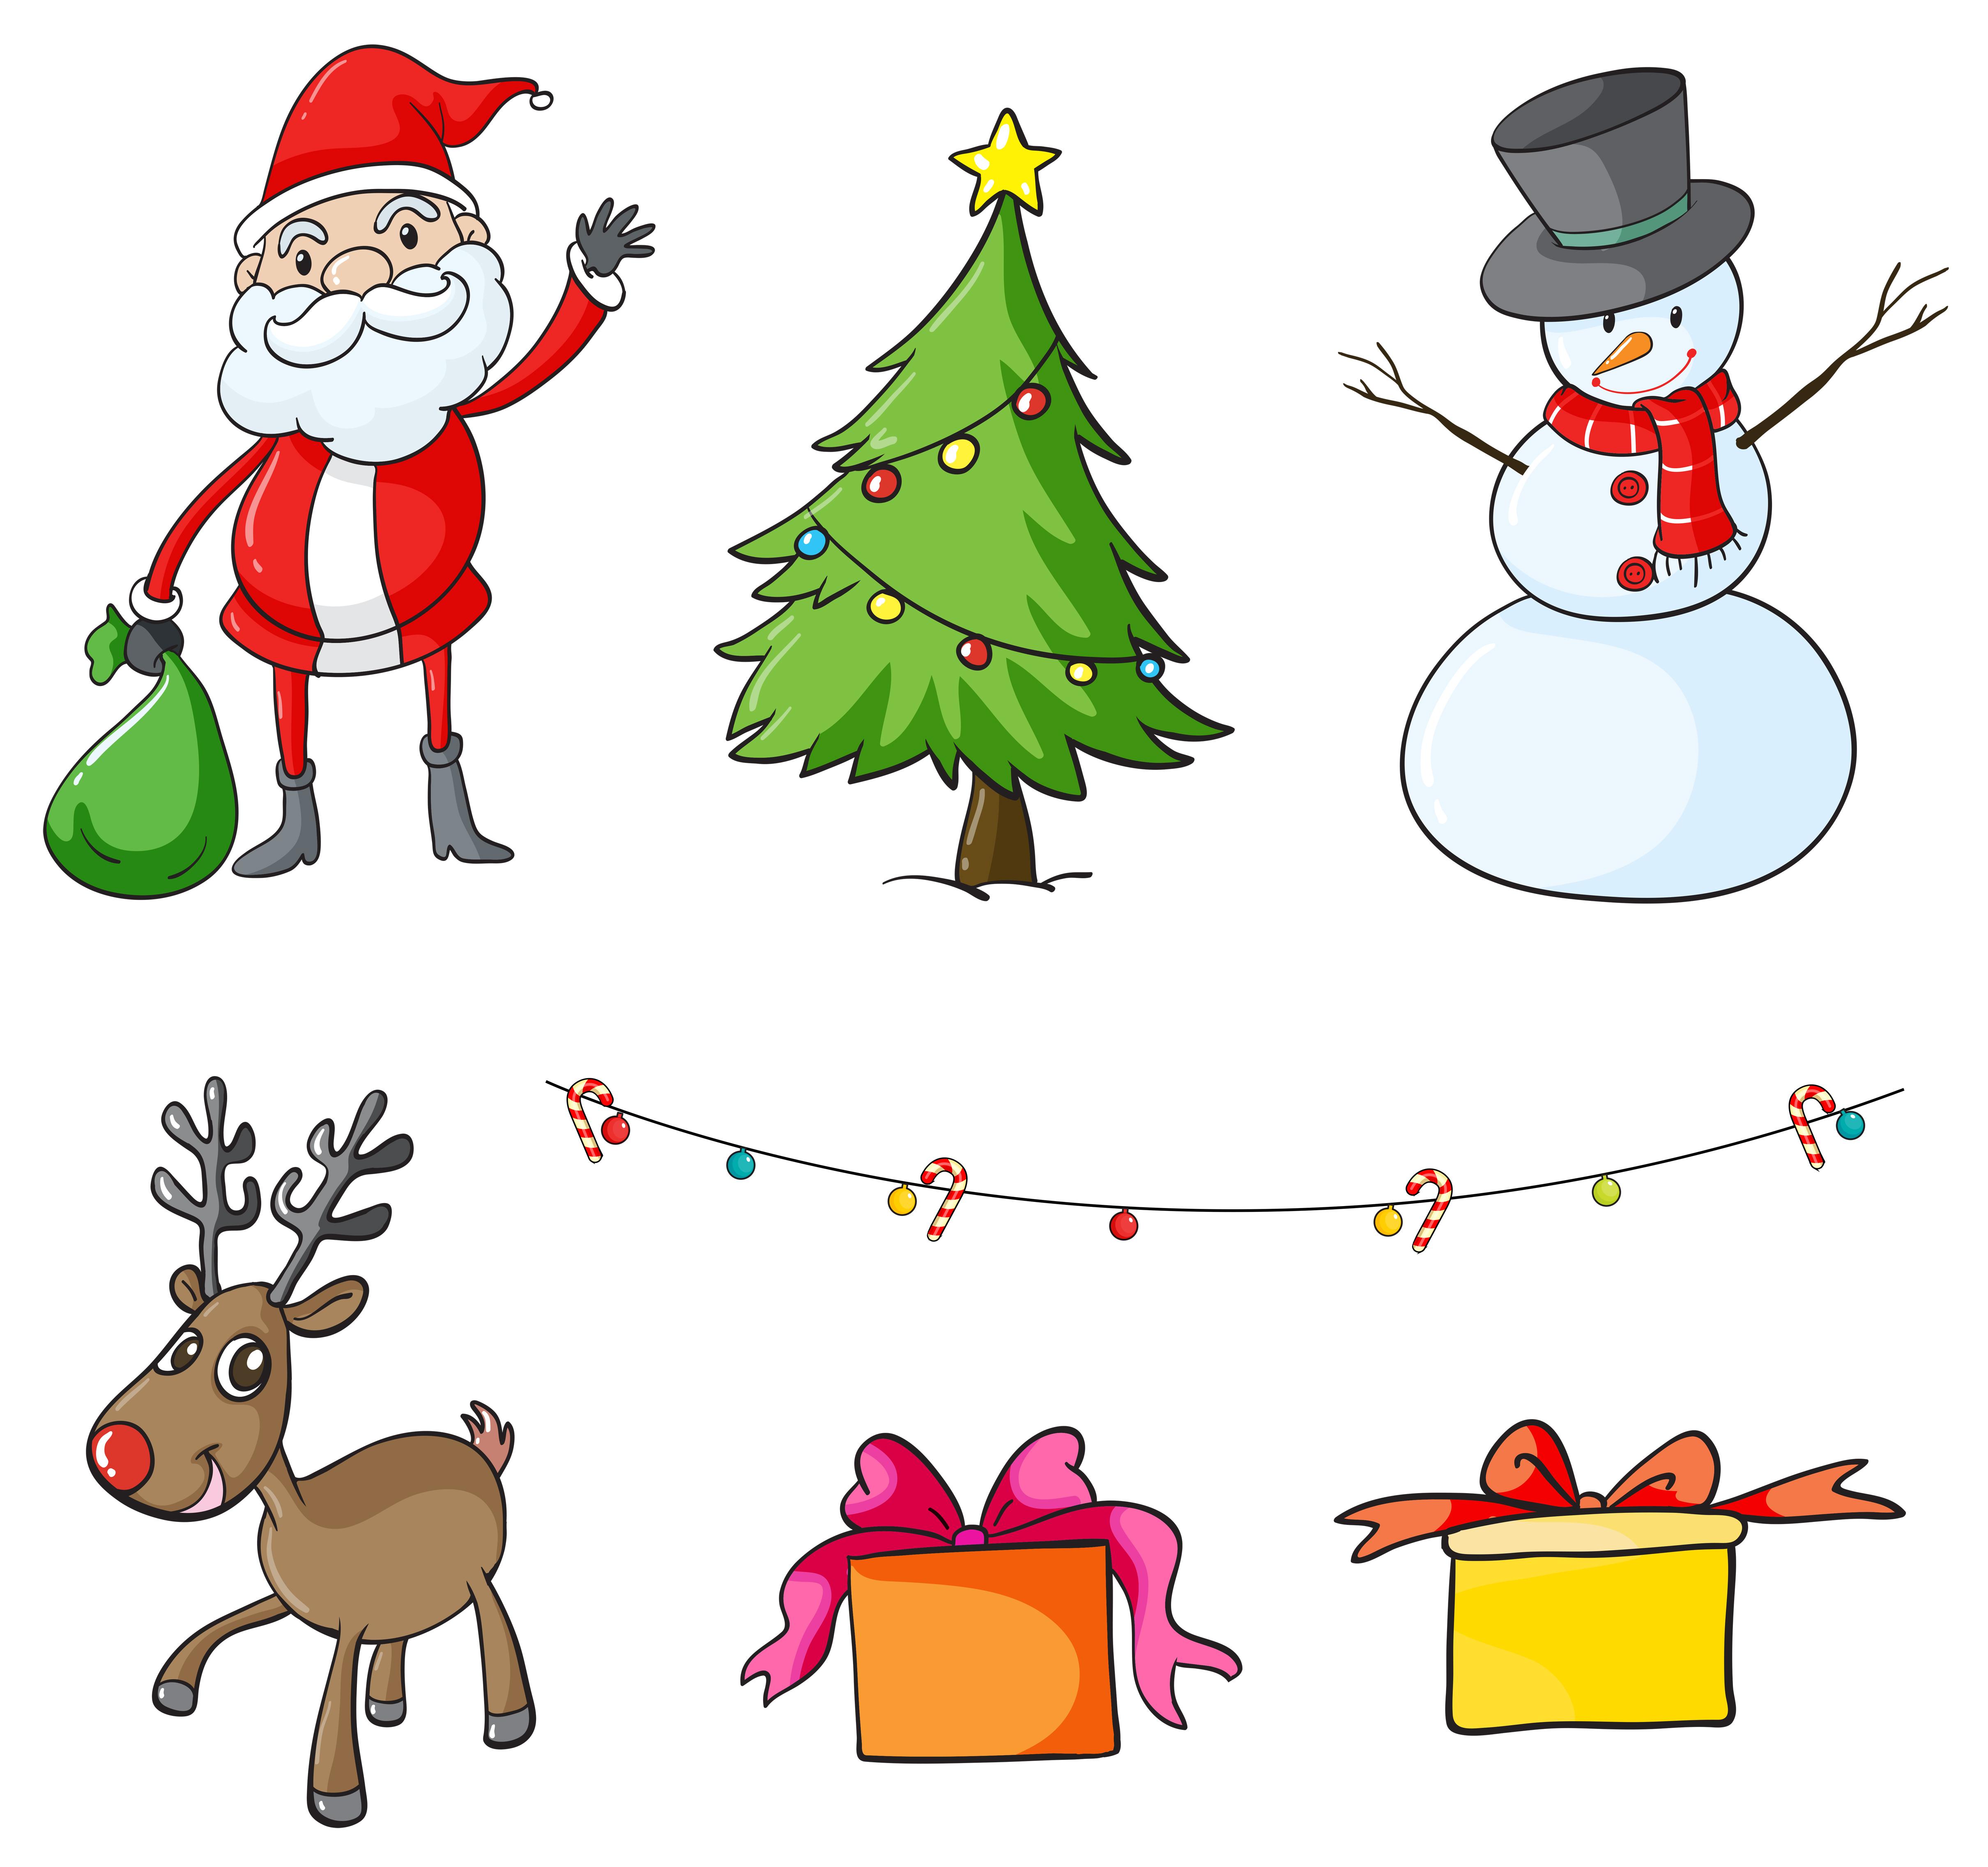 Christmas Symbols Free Vector Art - (6,669 Free Downloads)